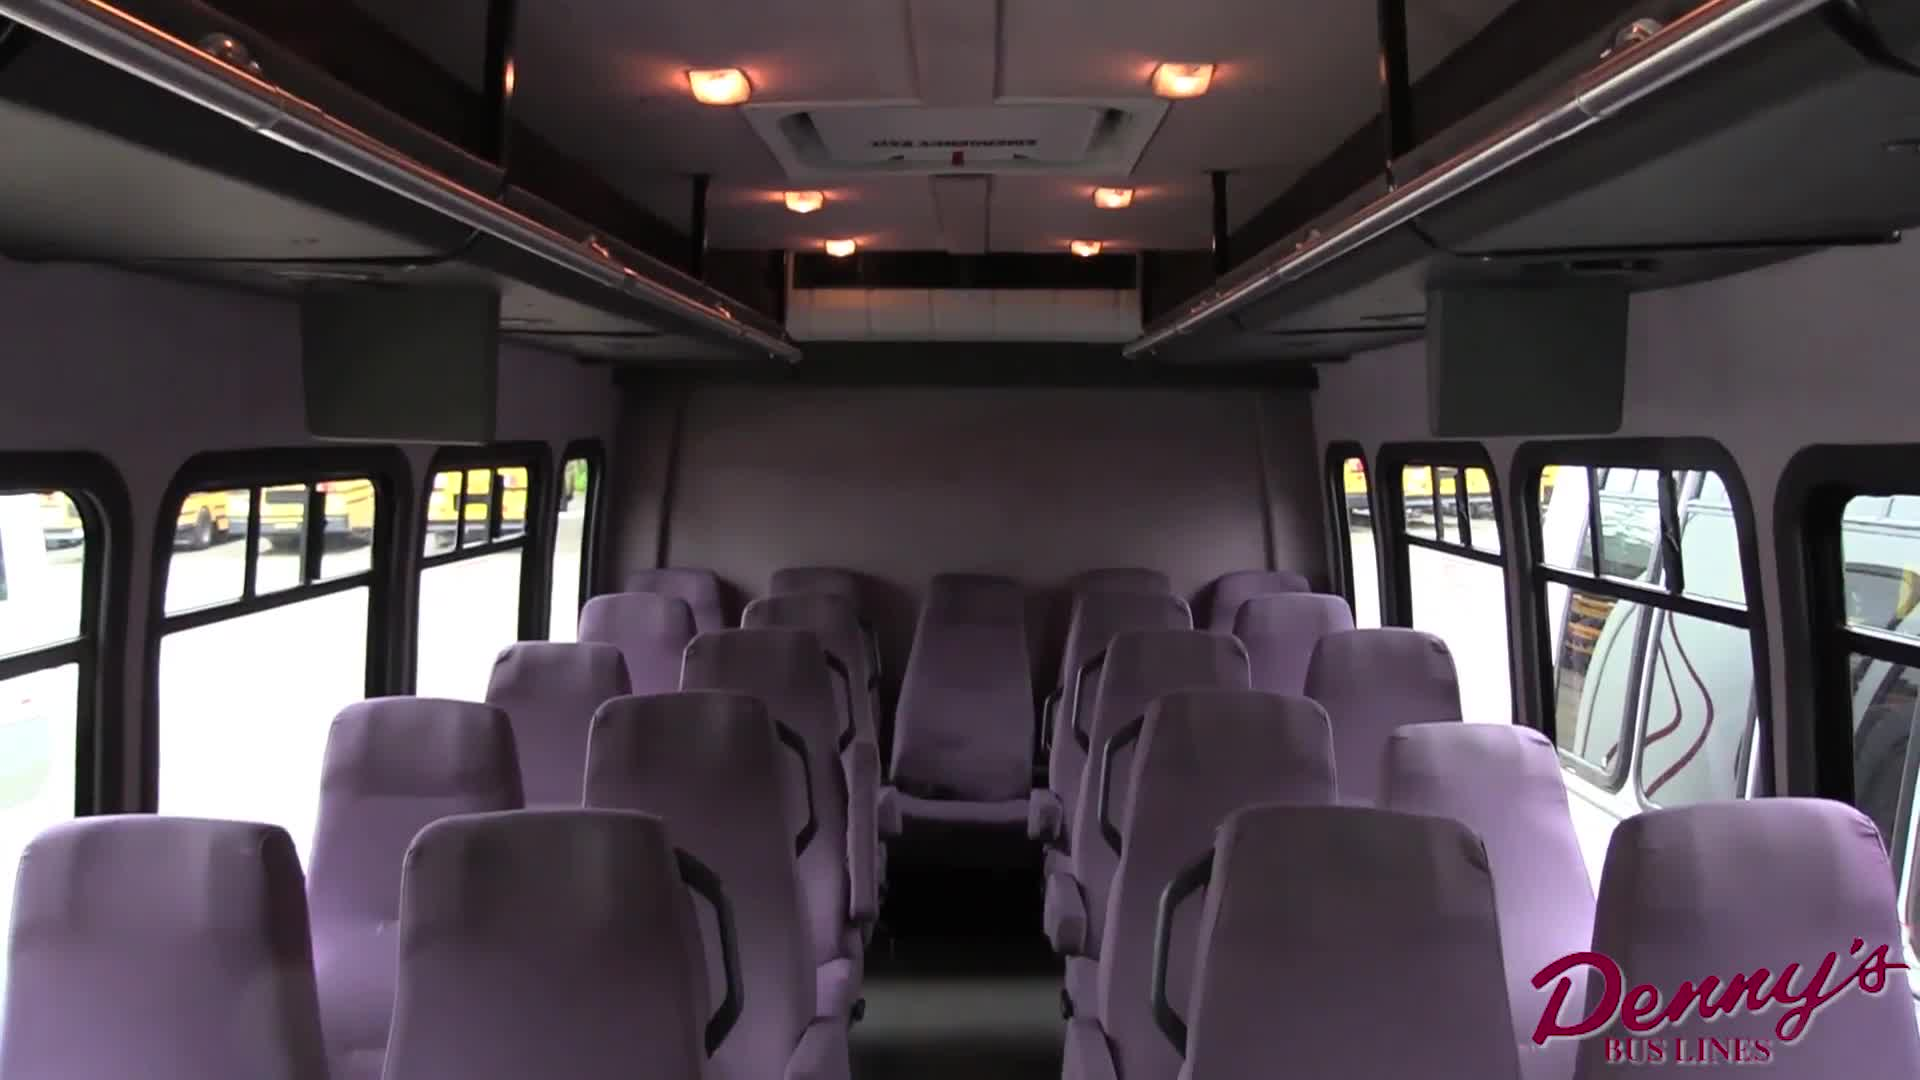 Denny Bus Lines Ltd - Bus & Coach Rental & Charter - 519-833-9117